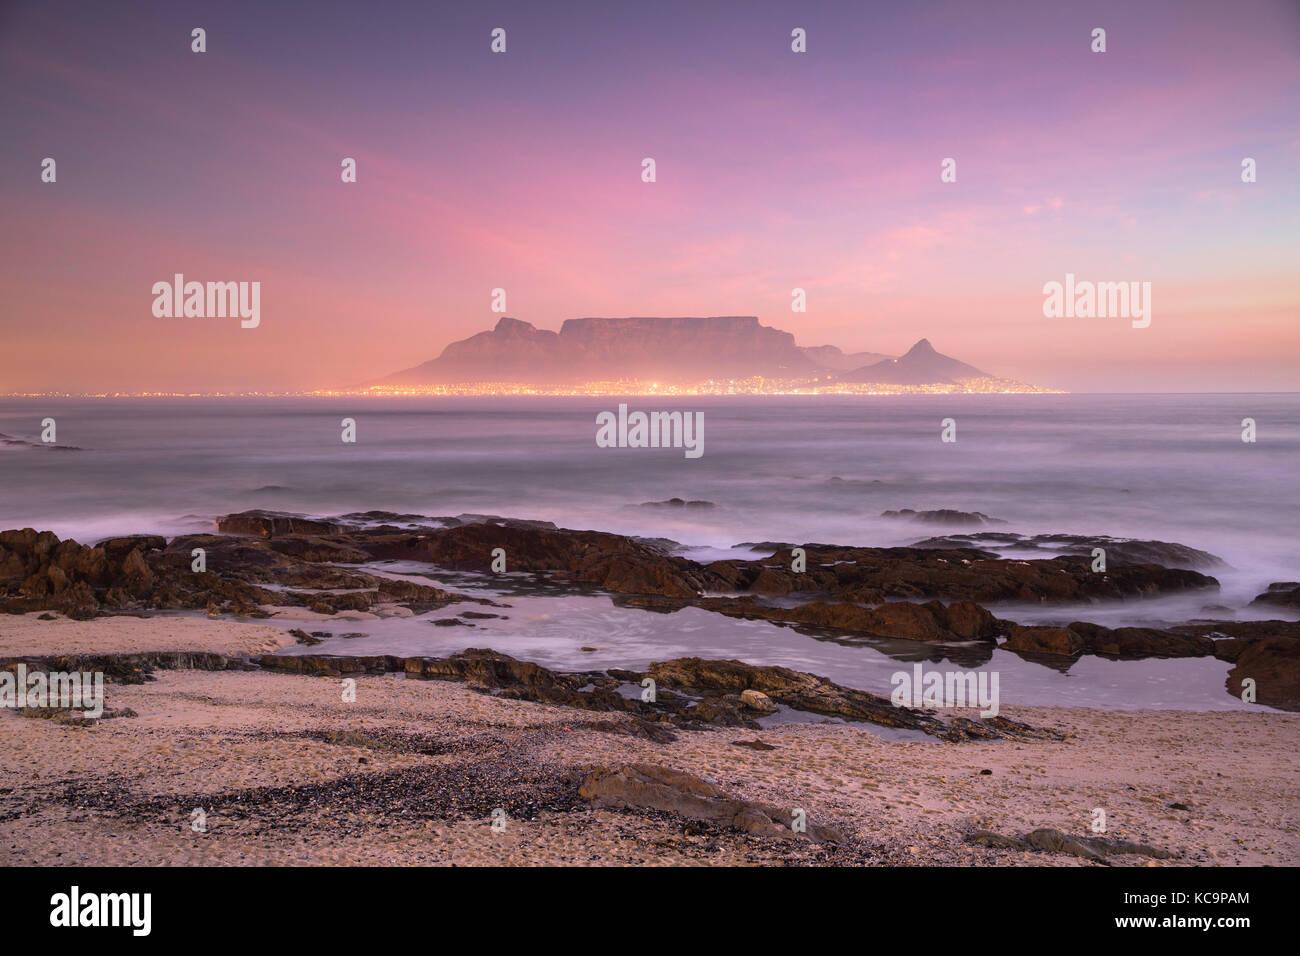 Blick auf den Tafelberg von bloubergstrand bei Sonnenuntergang, Cape Town, Western Cape, Südafrika Stockbild